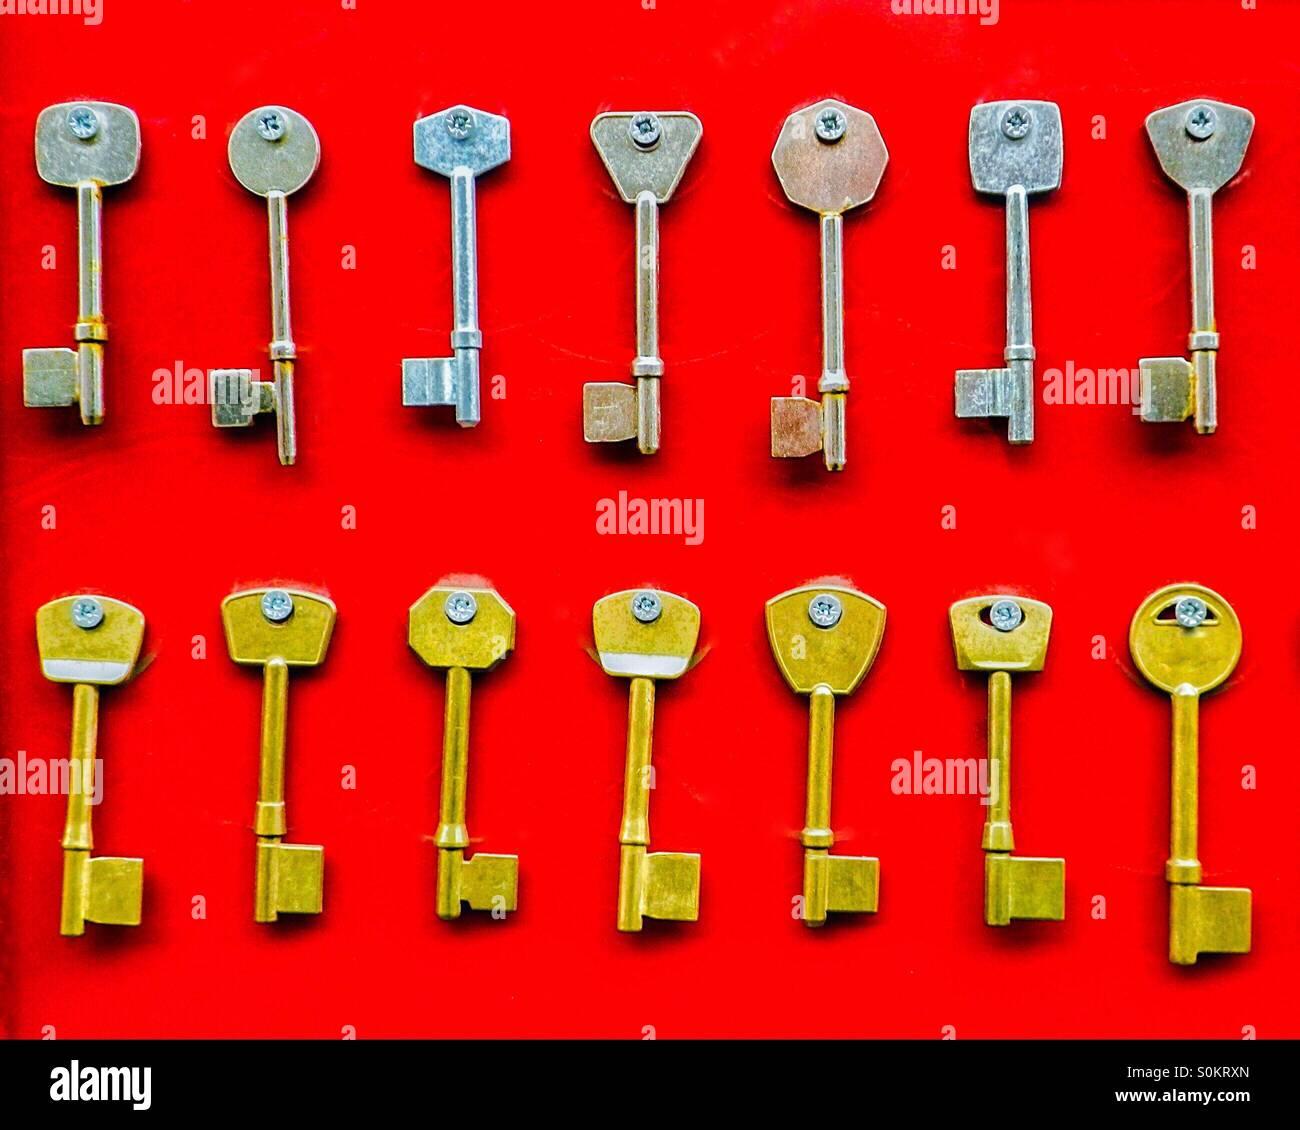 Selection of keys - Stock Image